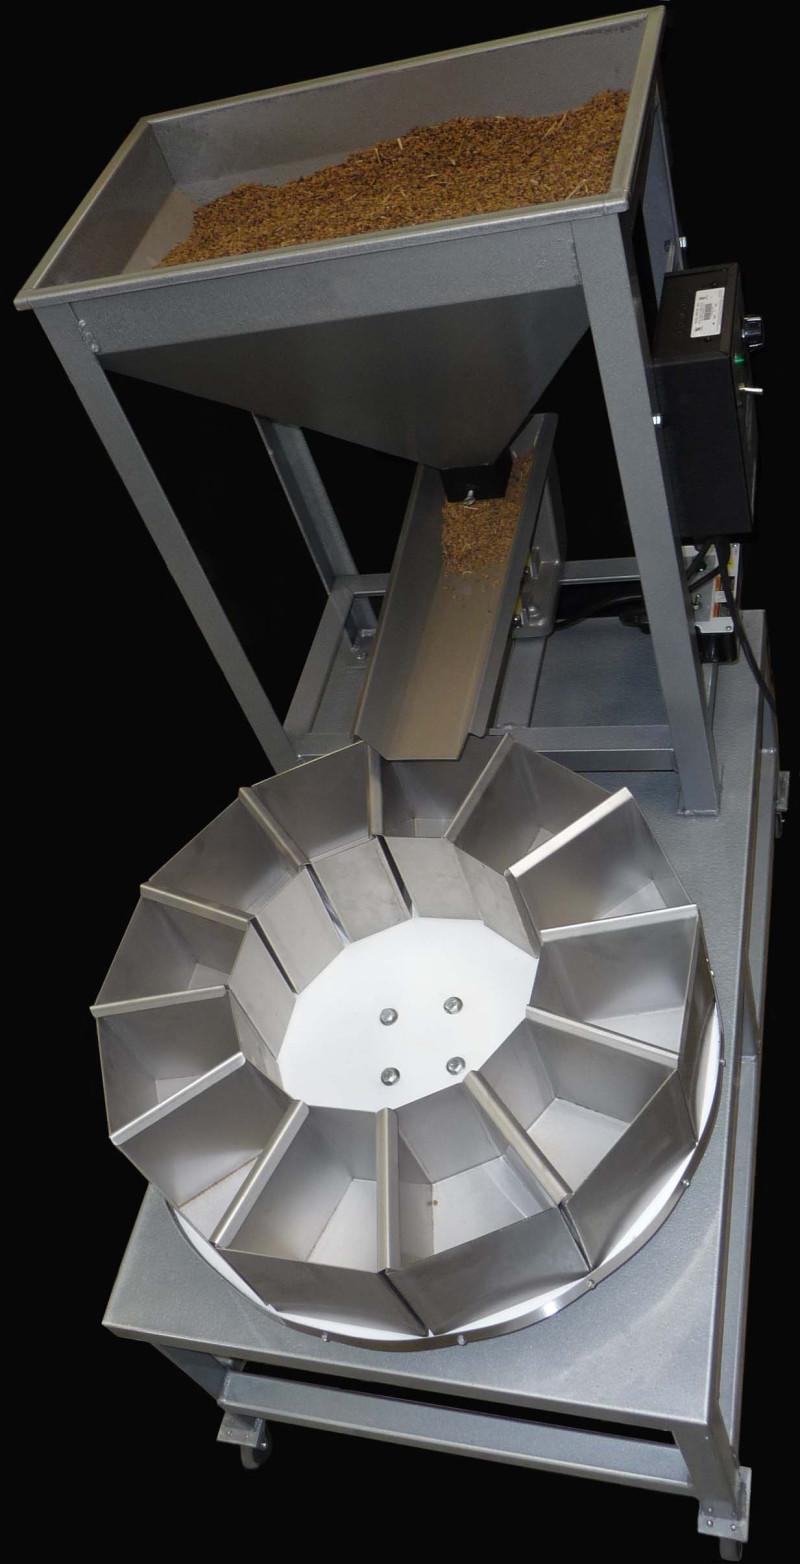 Spinning Rifflers For Dividing Large Bulk Samples Laval Lab